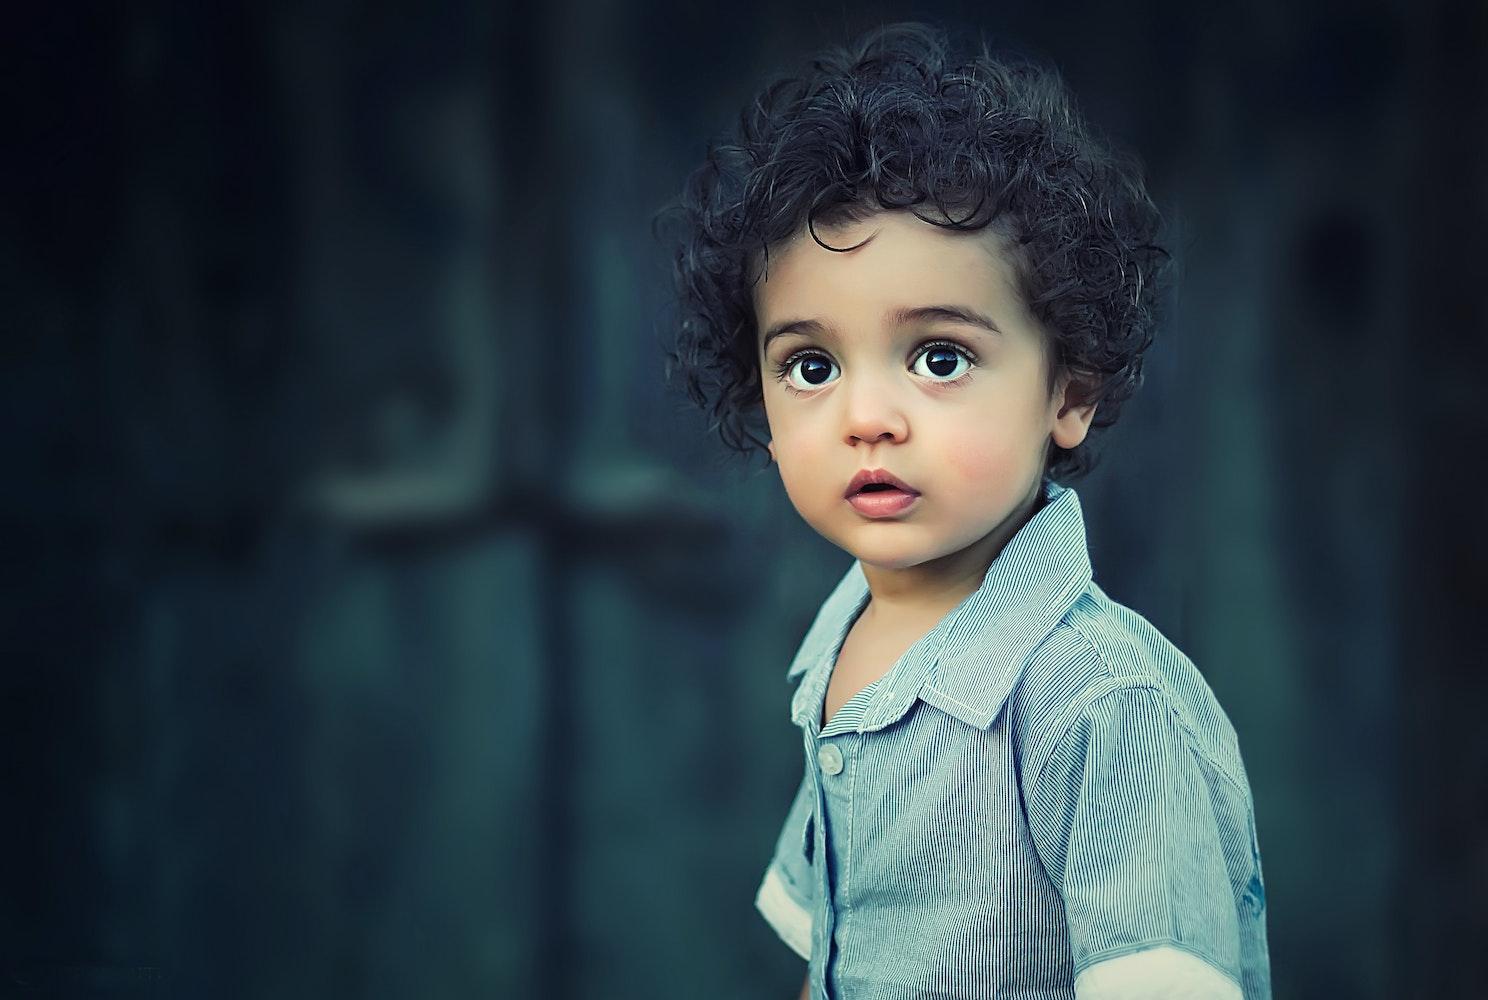 Boy Photos · Pexels · Free Stock Photos